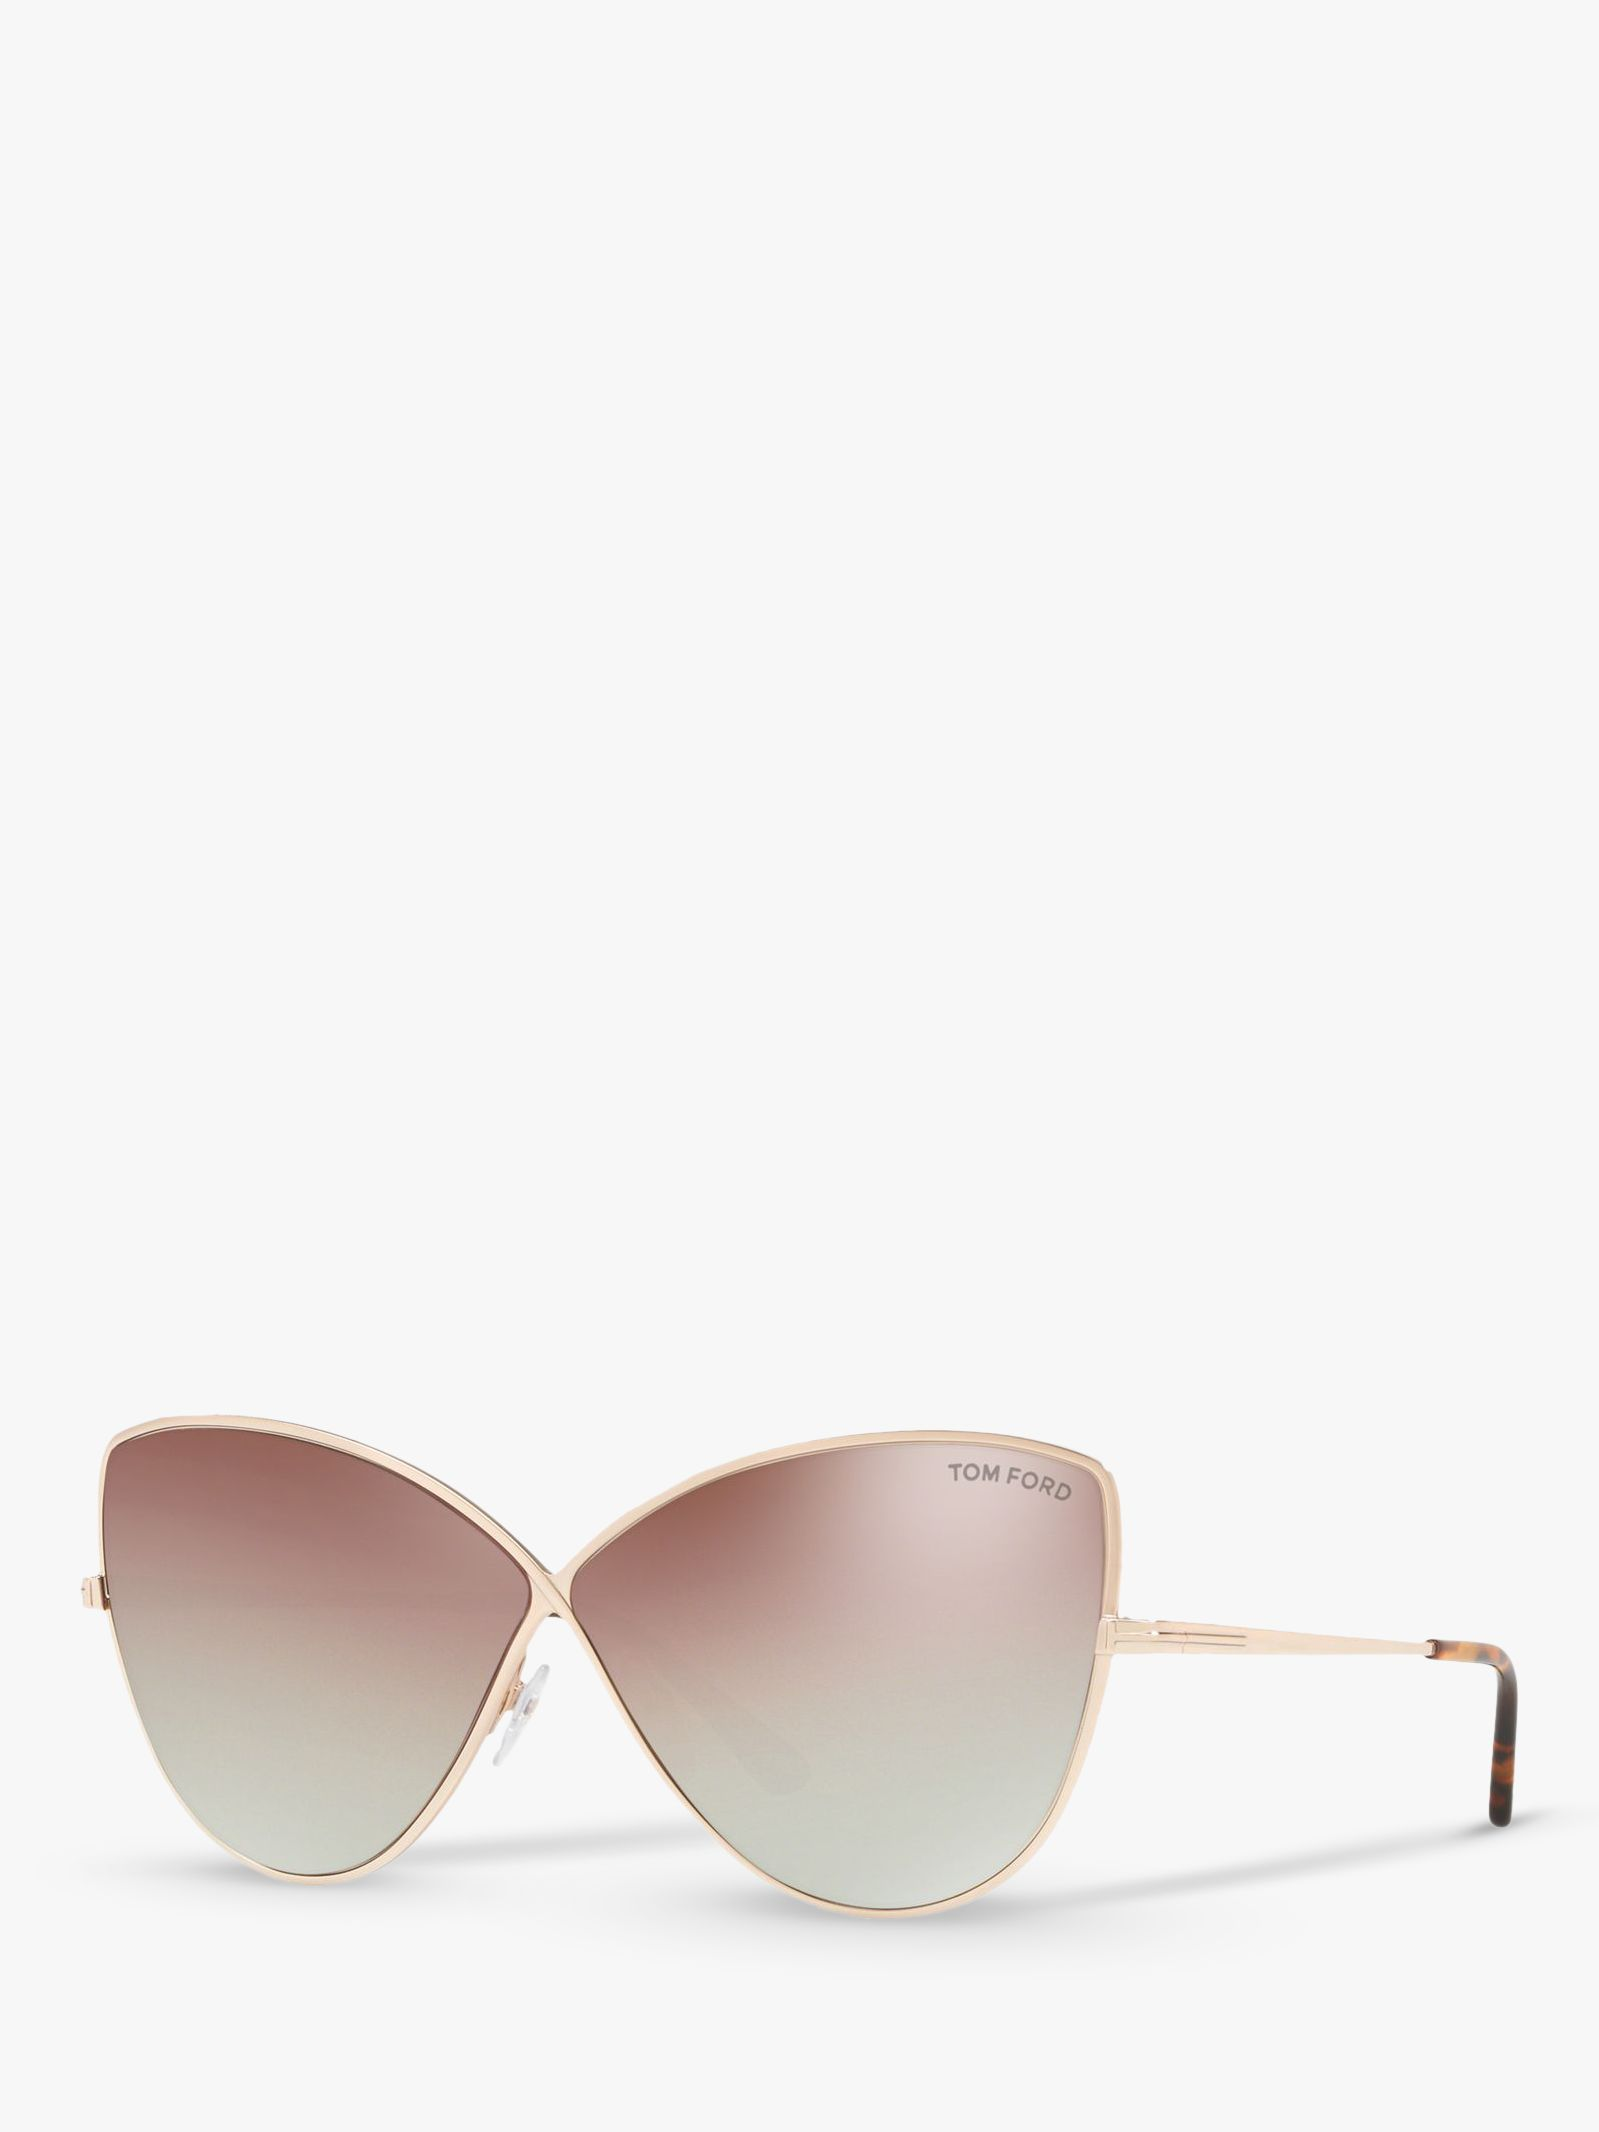 Tom Ford TOM FORD FT0569 Women's Elise-02 Cat's Eye Sunglasses, Rose Gold/Mirror Pink